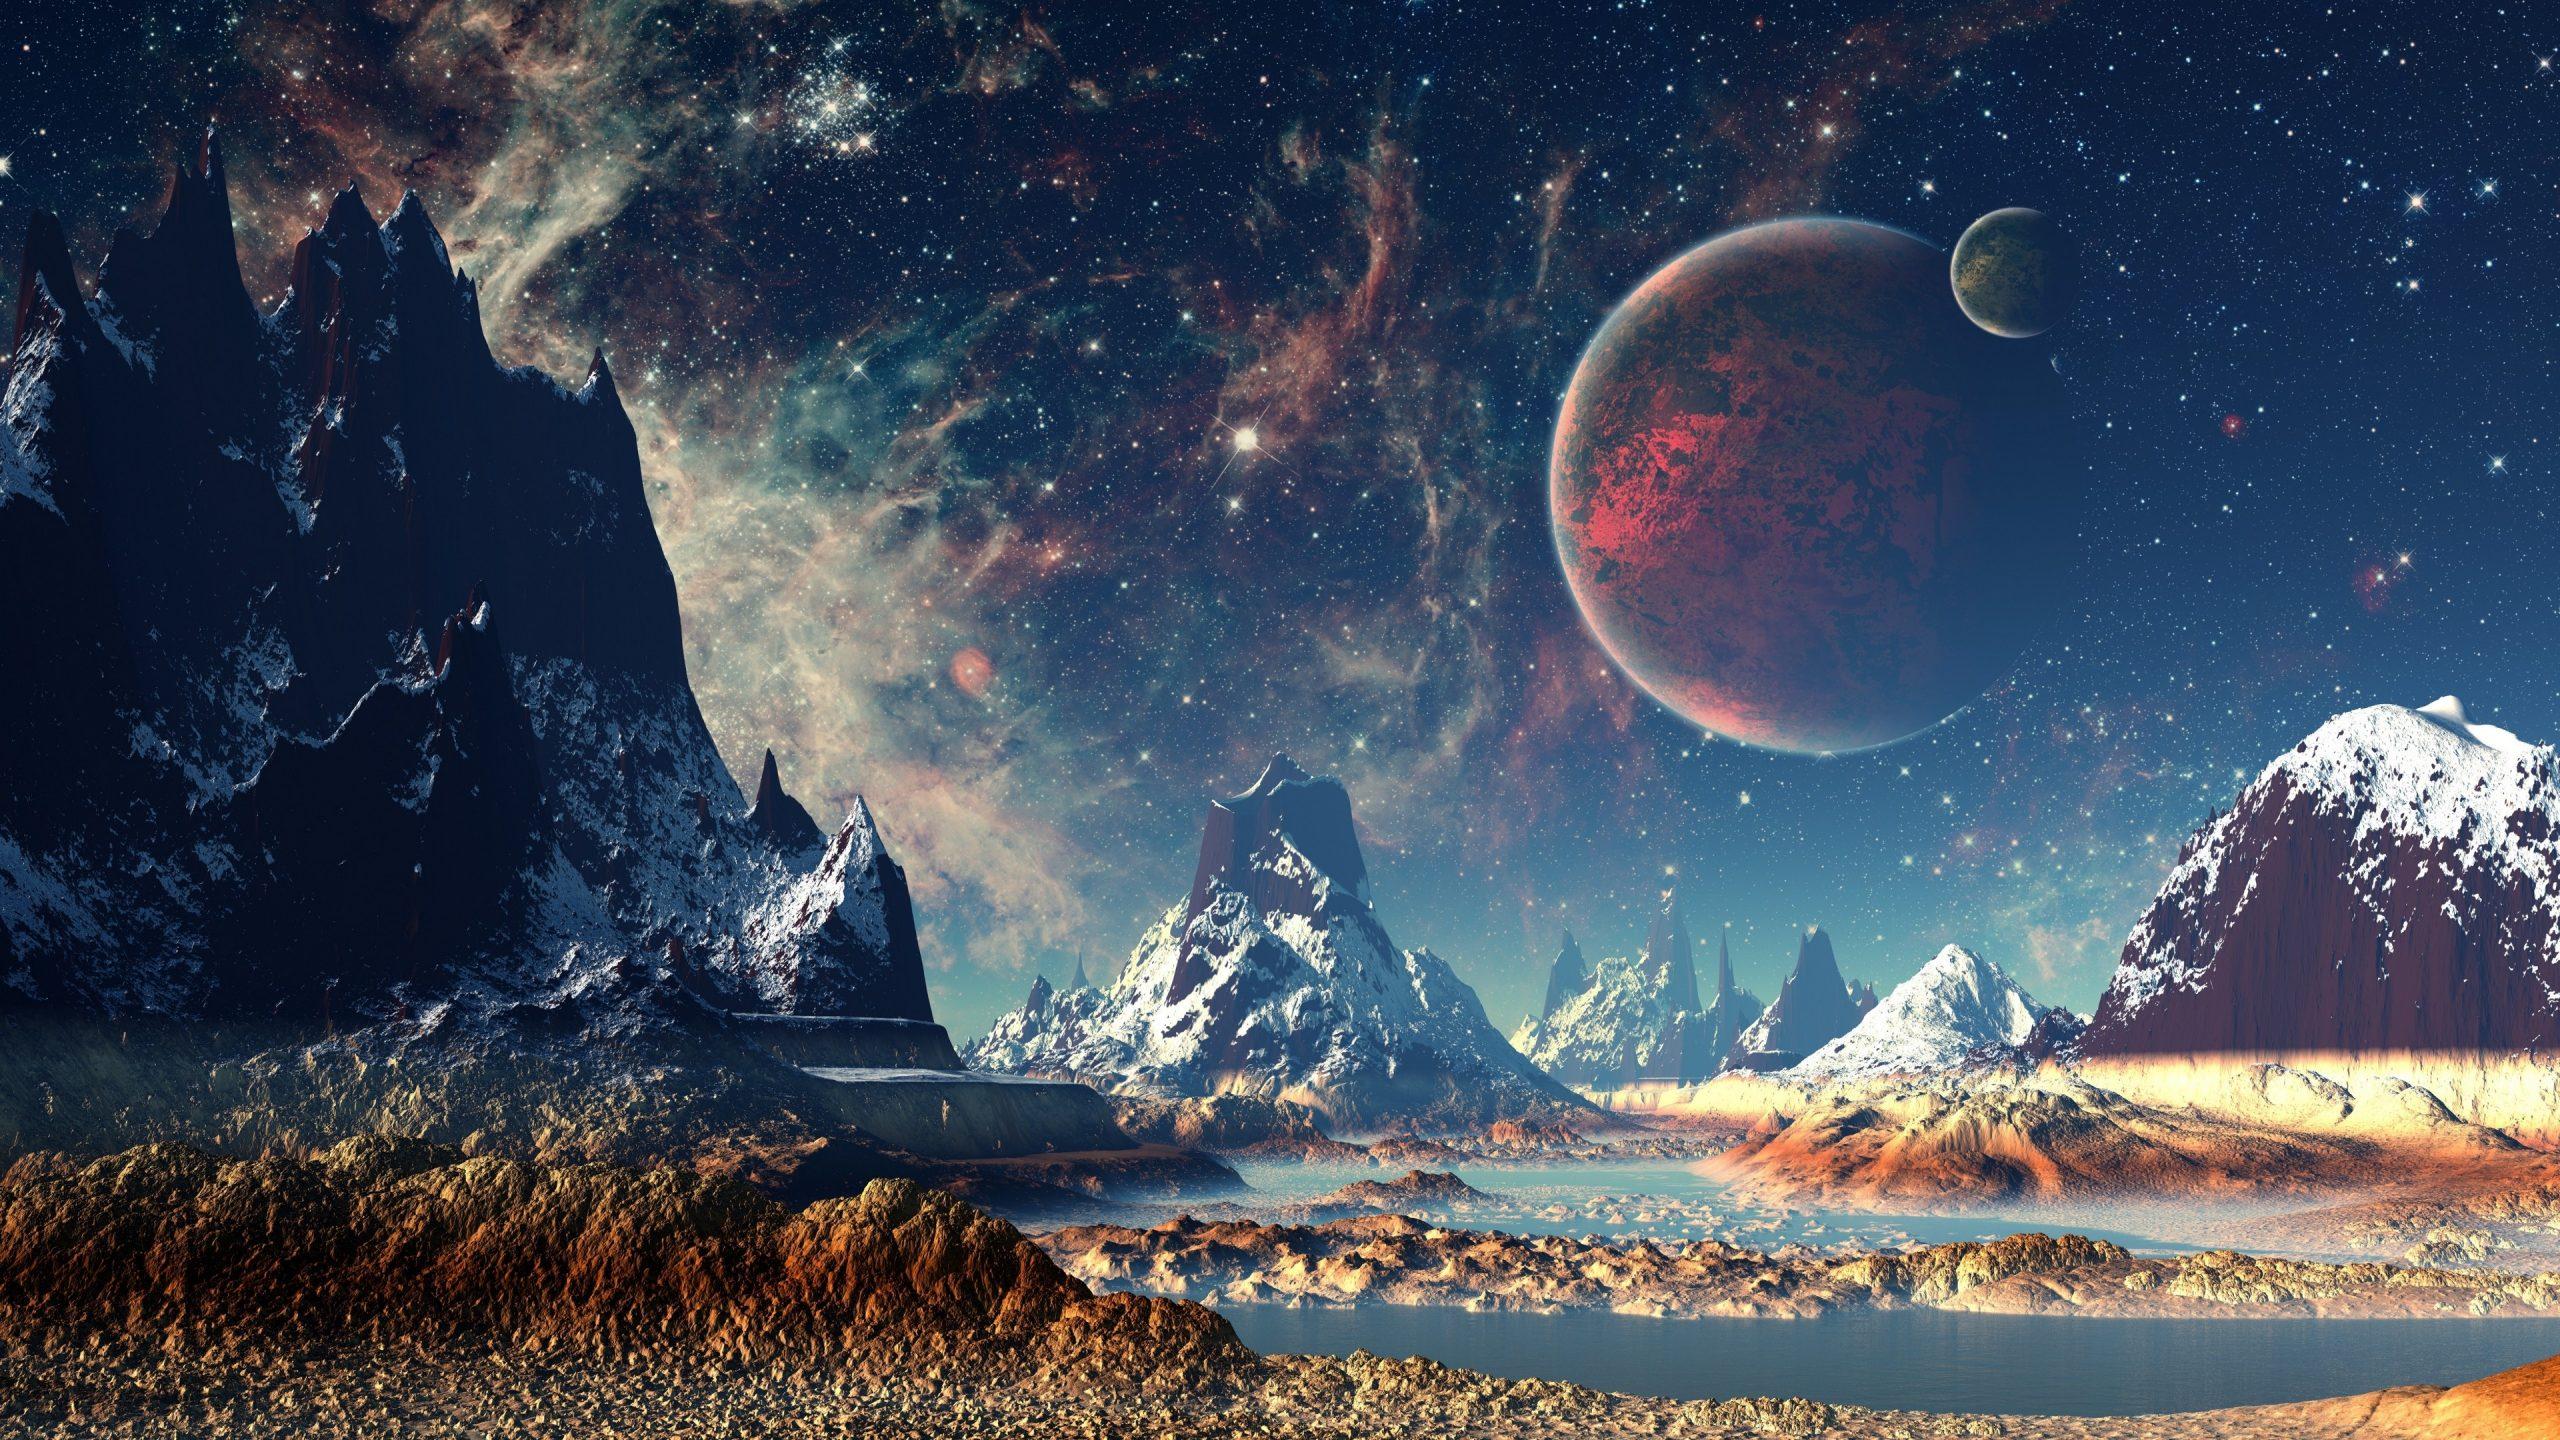 4k Creative Universe Planet Wallpaper Wallpaper Download High Resolution 4k Wallpaper